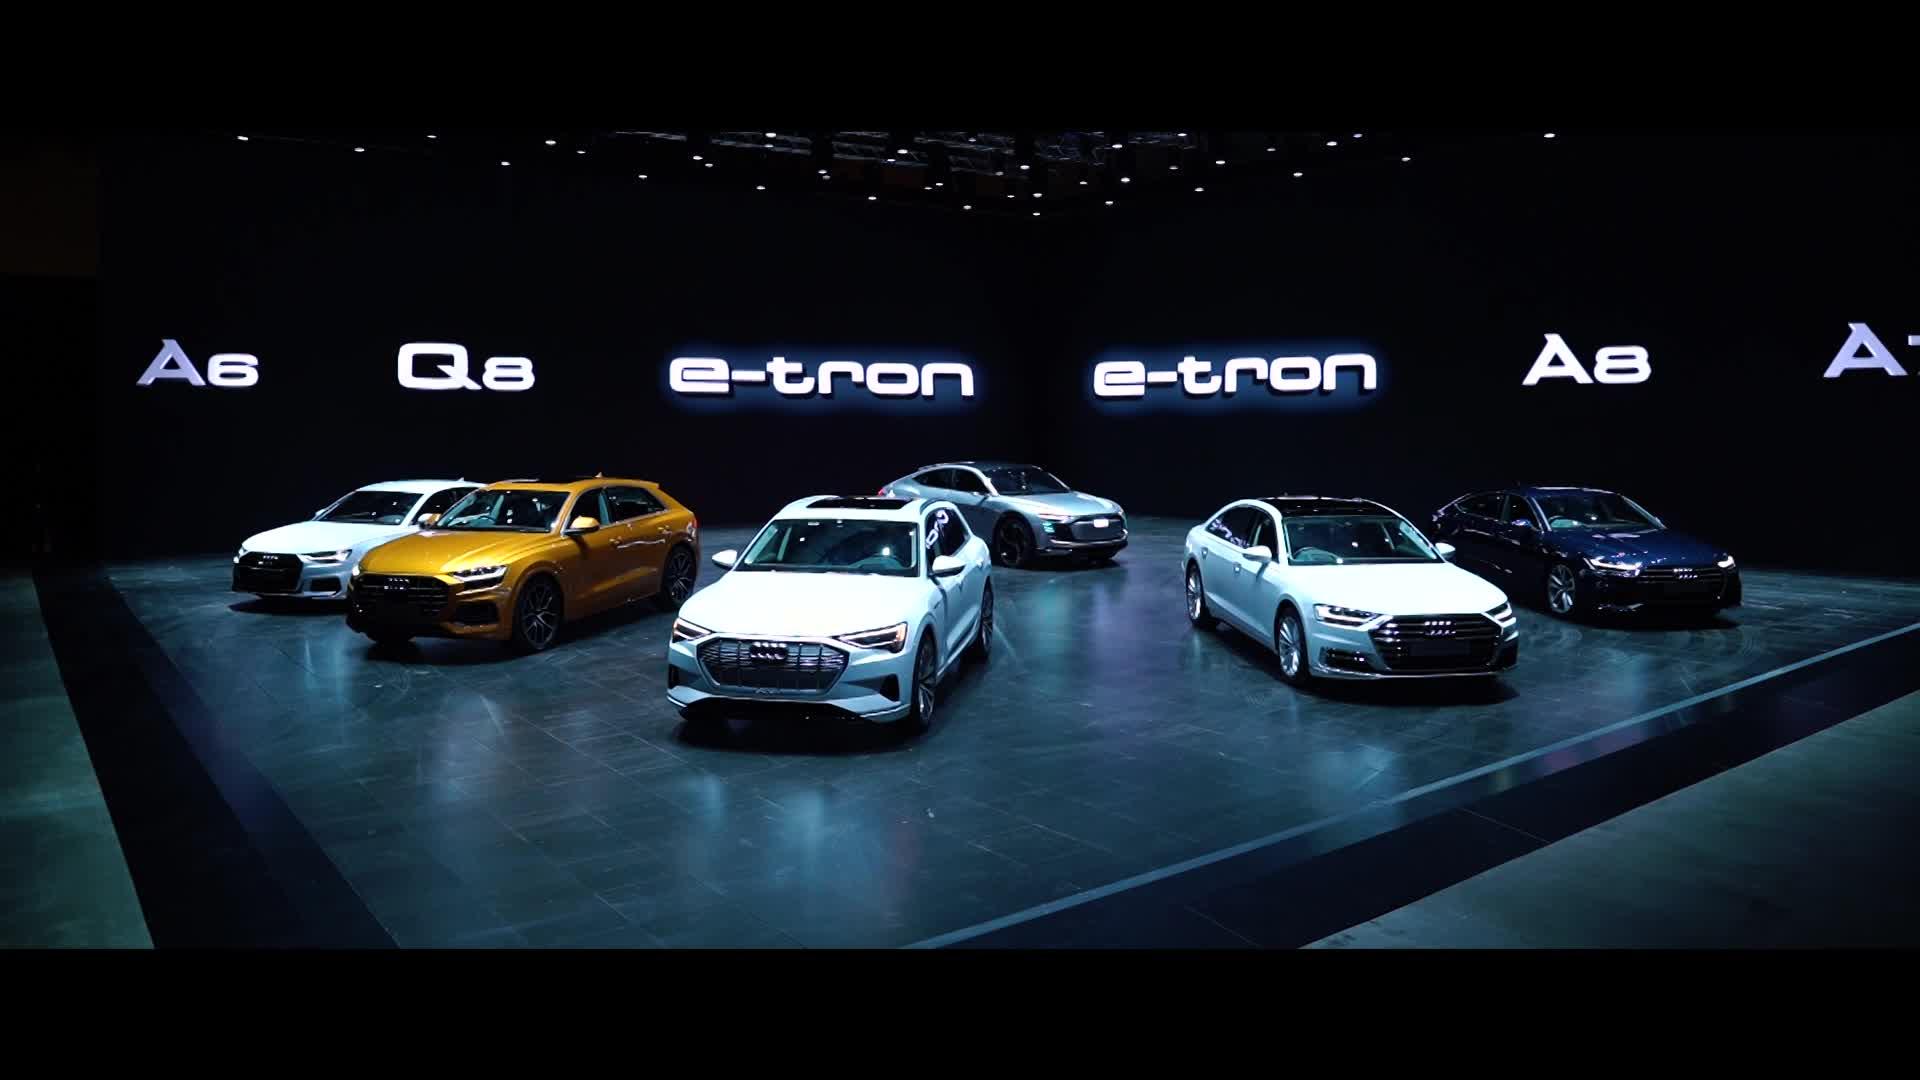 Audi tại triển lãm Brand Experience Singapore 2018